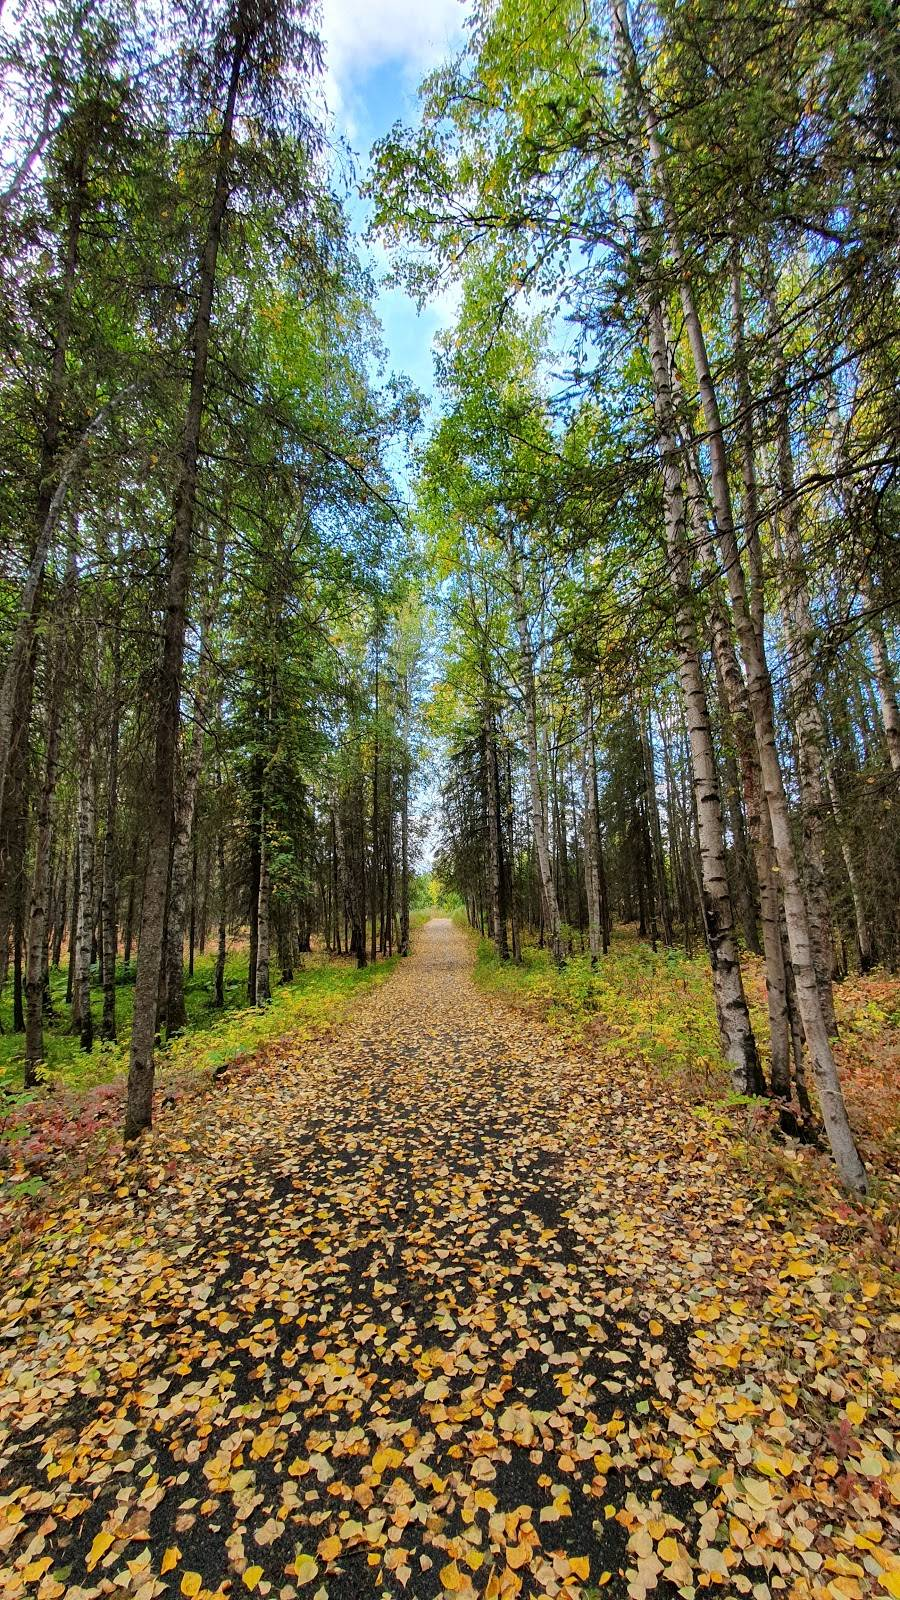 Arnold L. Muldoon Park - park  | Photo 4 of 8 | Address: 7600 E Northern Lights Blvd, Anchorage, AK 99504, USA | Phone: (907) 343-4355